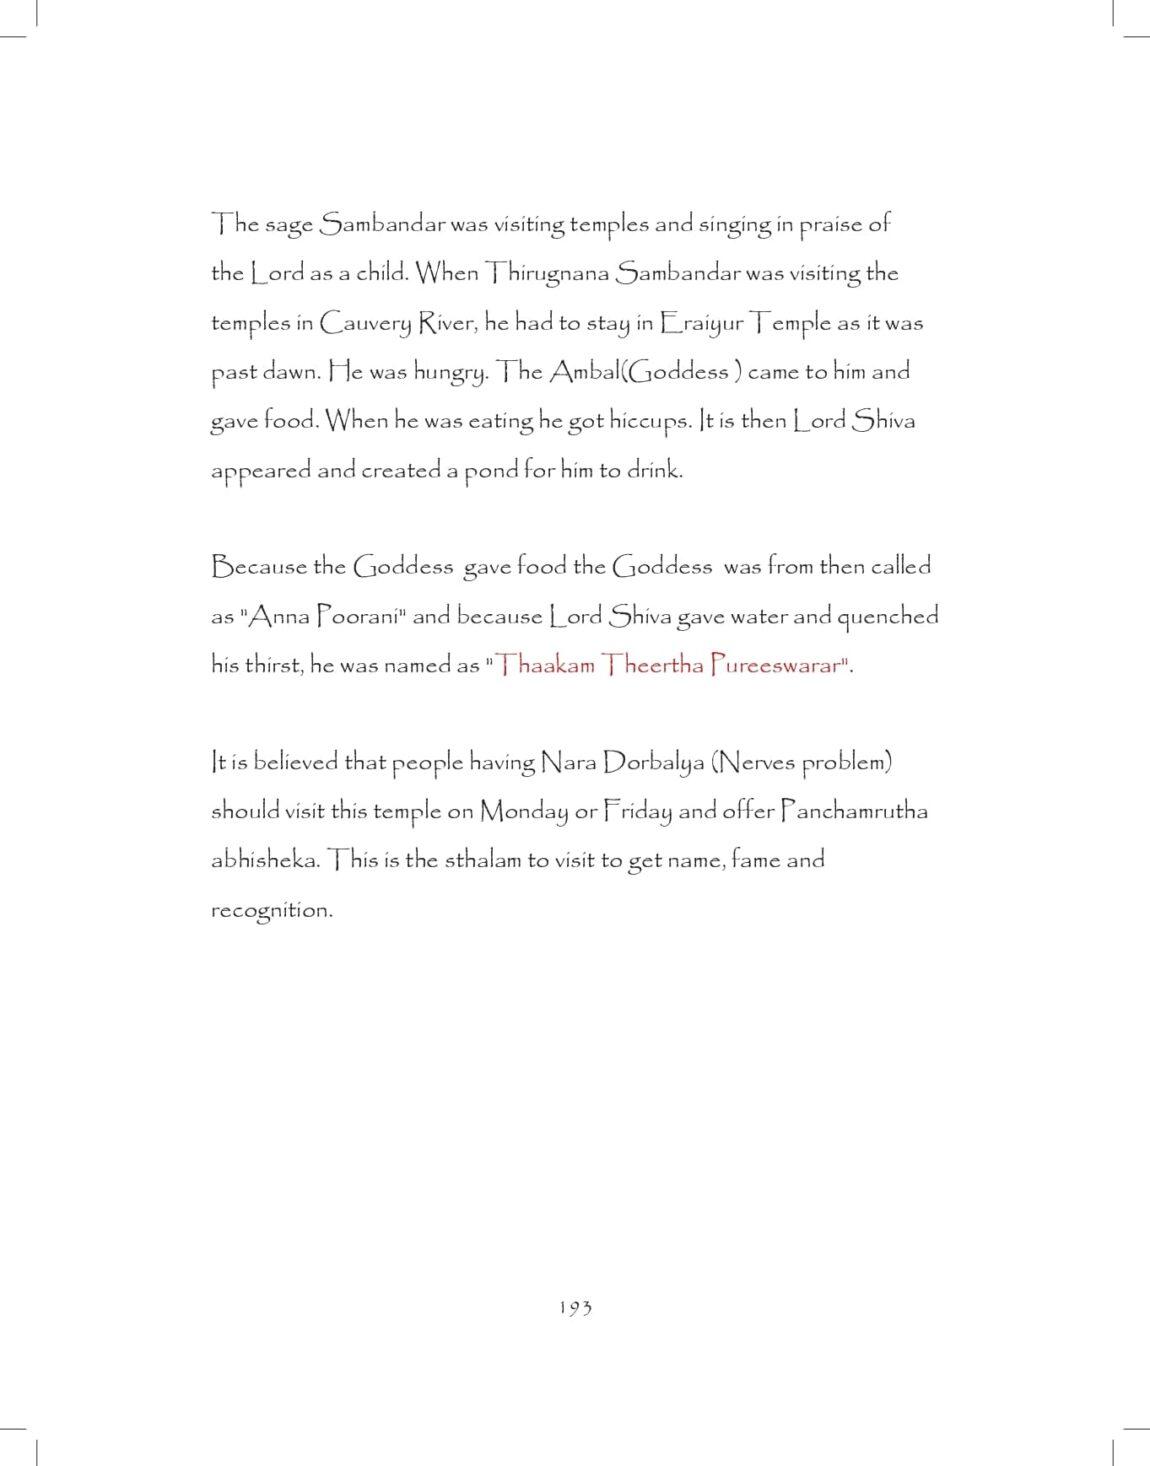 Ganesh-print_pages-to-jpg-0193.jpg